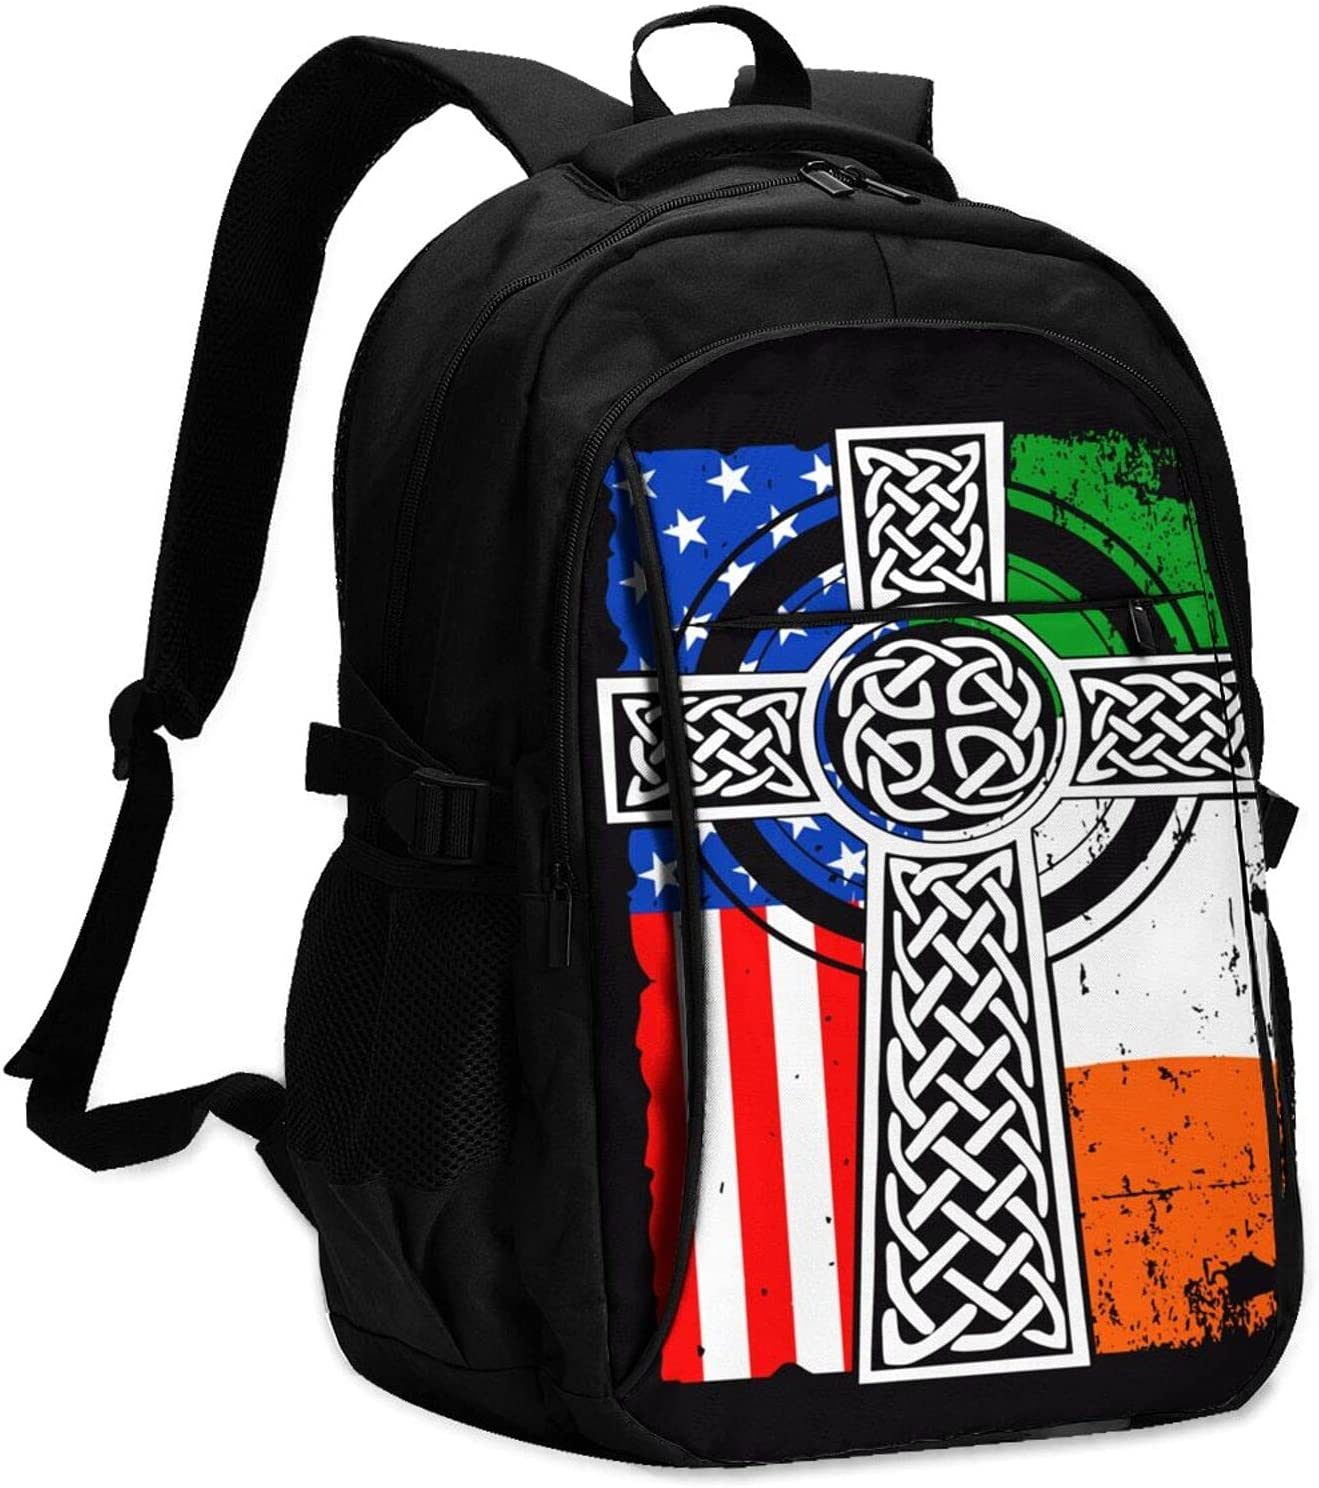 Irish Recommendation American Sale Usa Flag Celtic Cross And13-16 Port Charging Usb